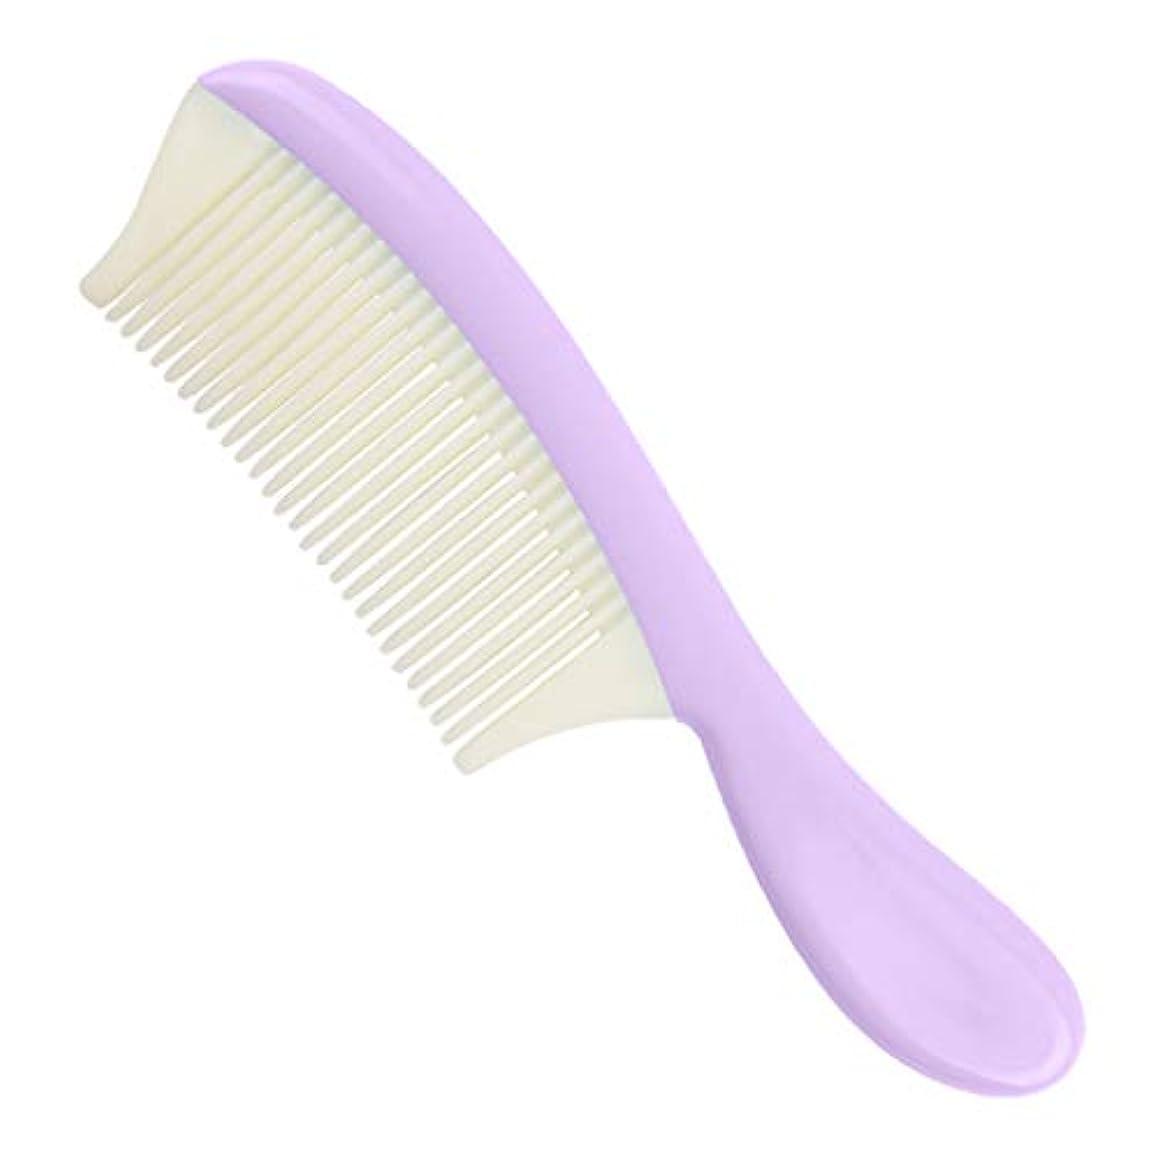 gazechimp ヘアコーム 取り外し可能 細かい歯 ヘアブラシ 髪の櫛 全4色 - 紫